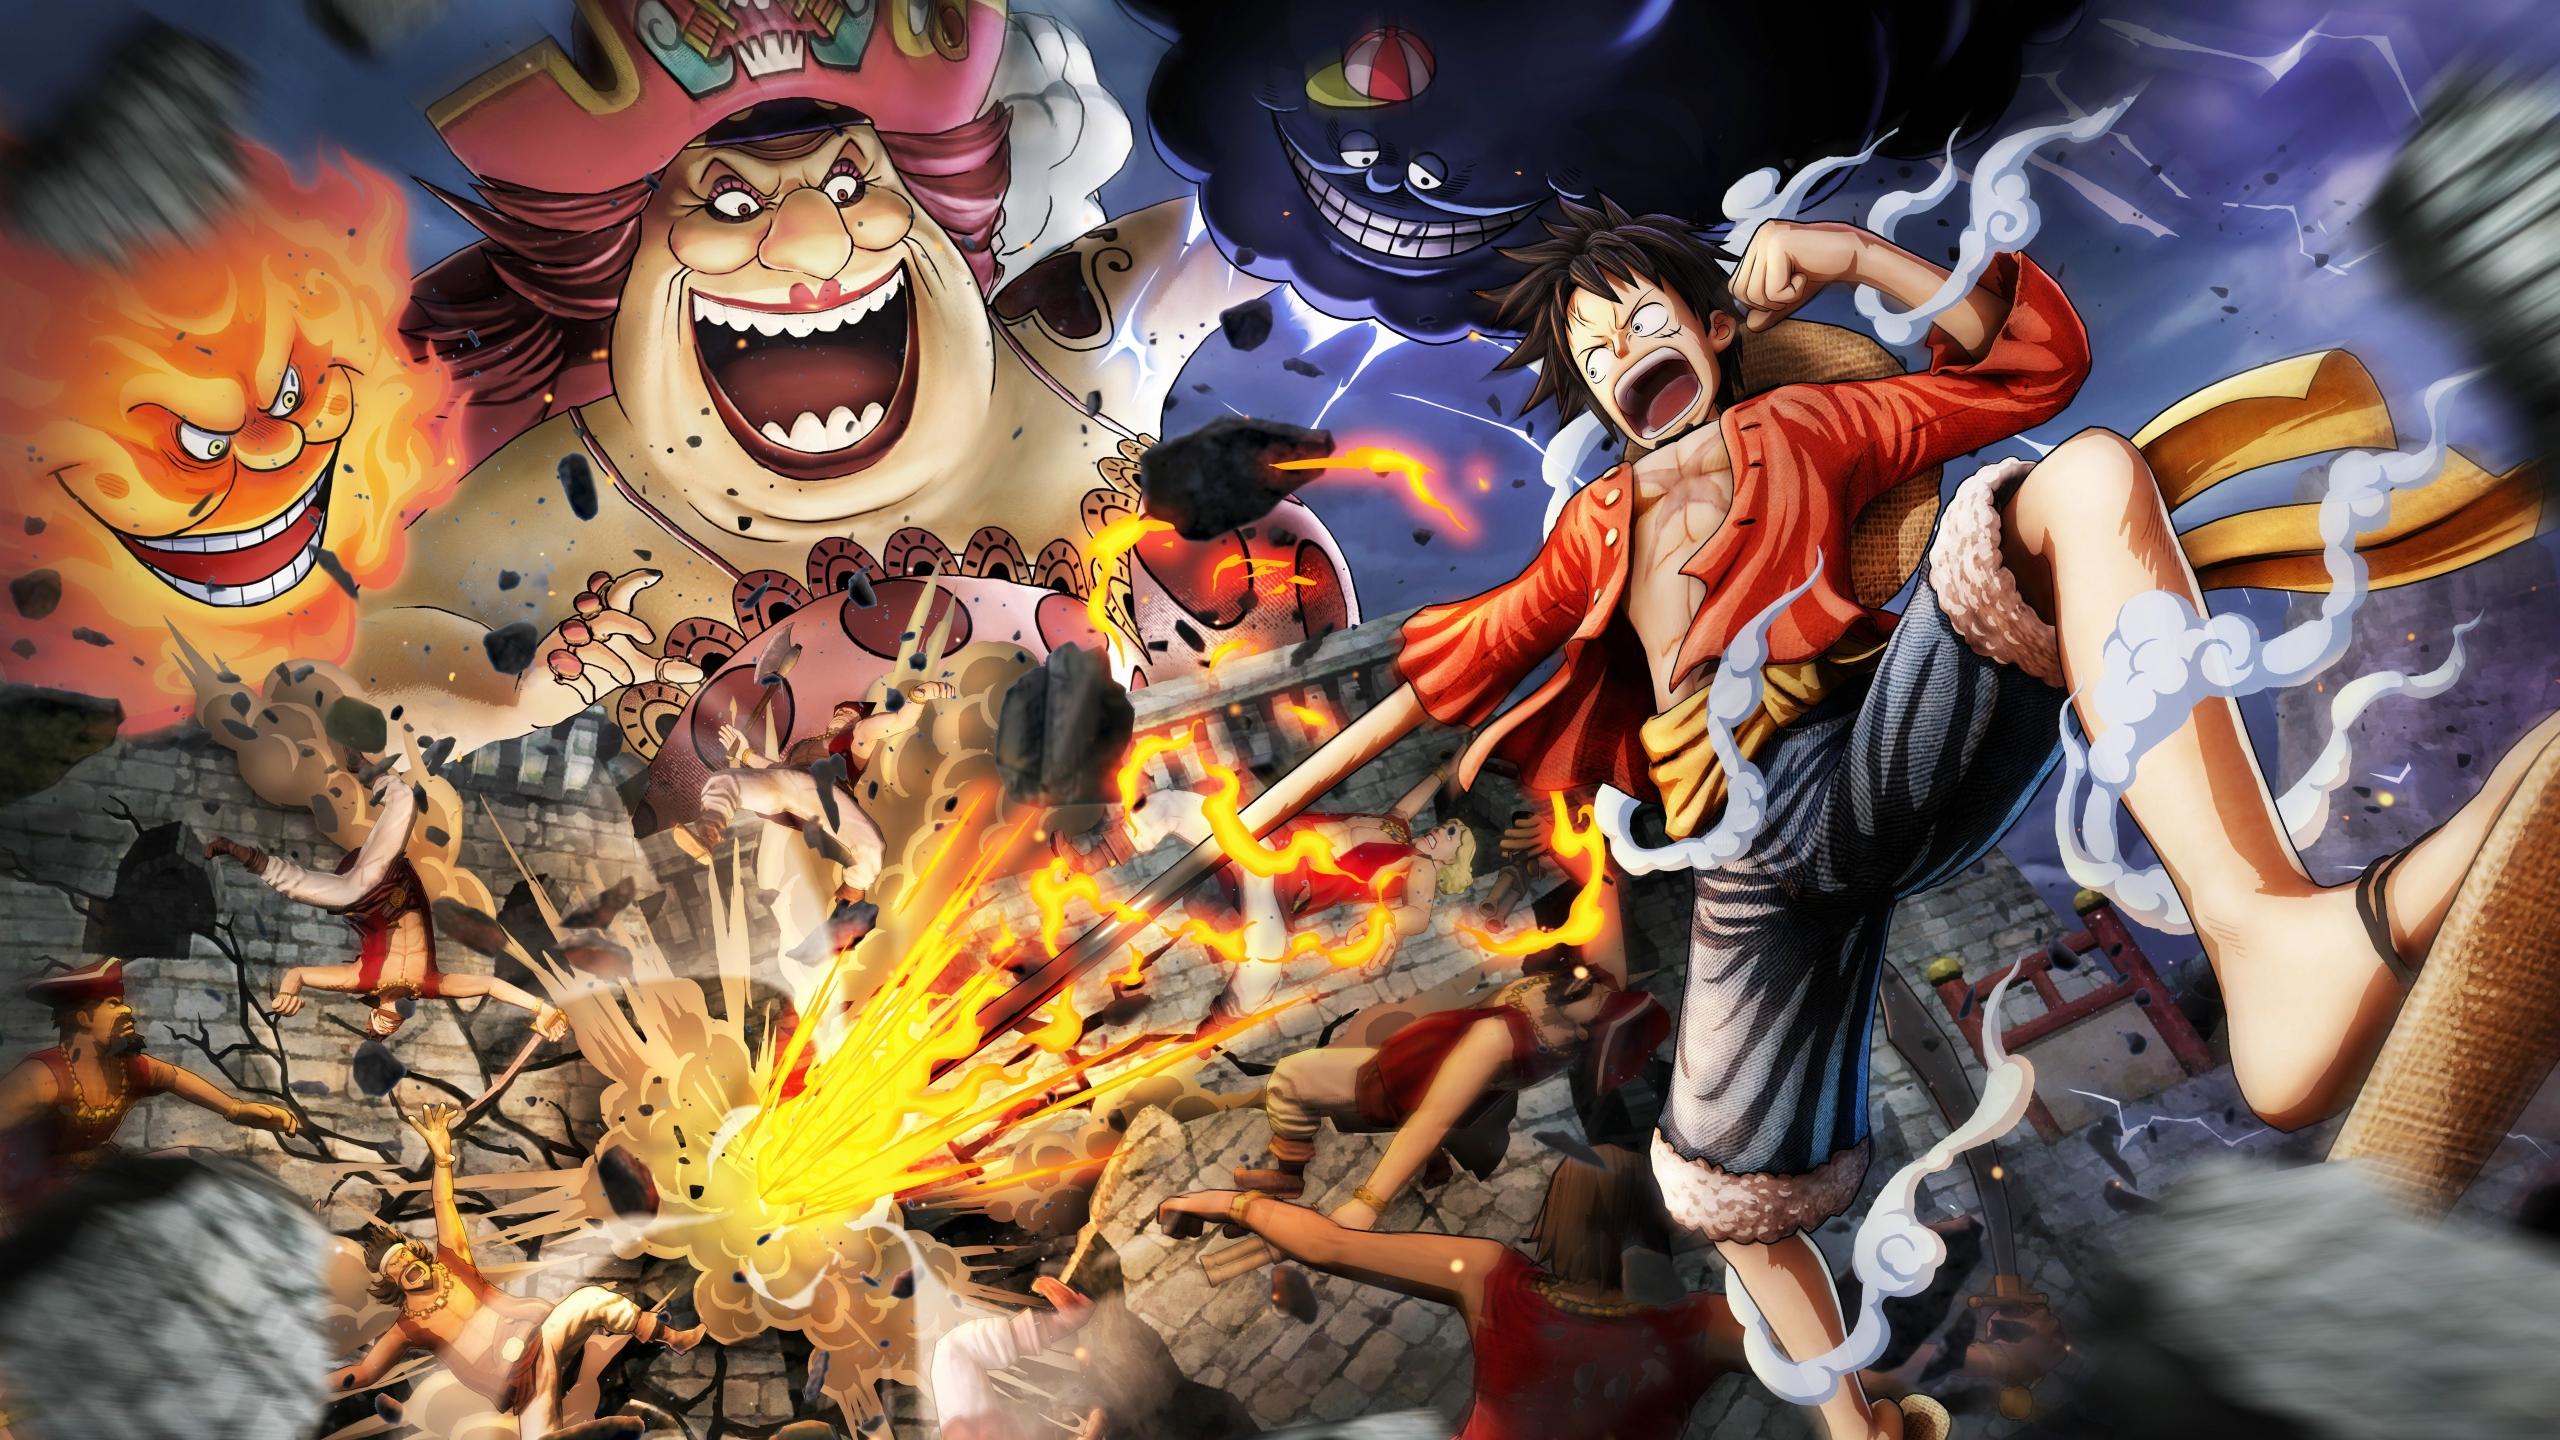 2560x1440 One Piece Pirate Warriors 1440p Resolution